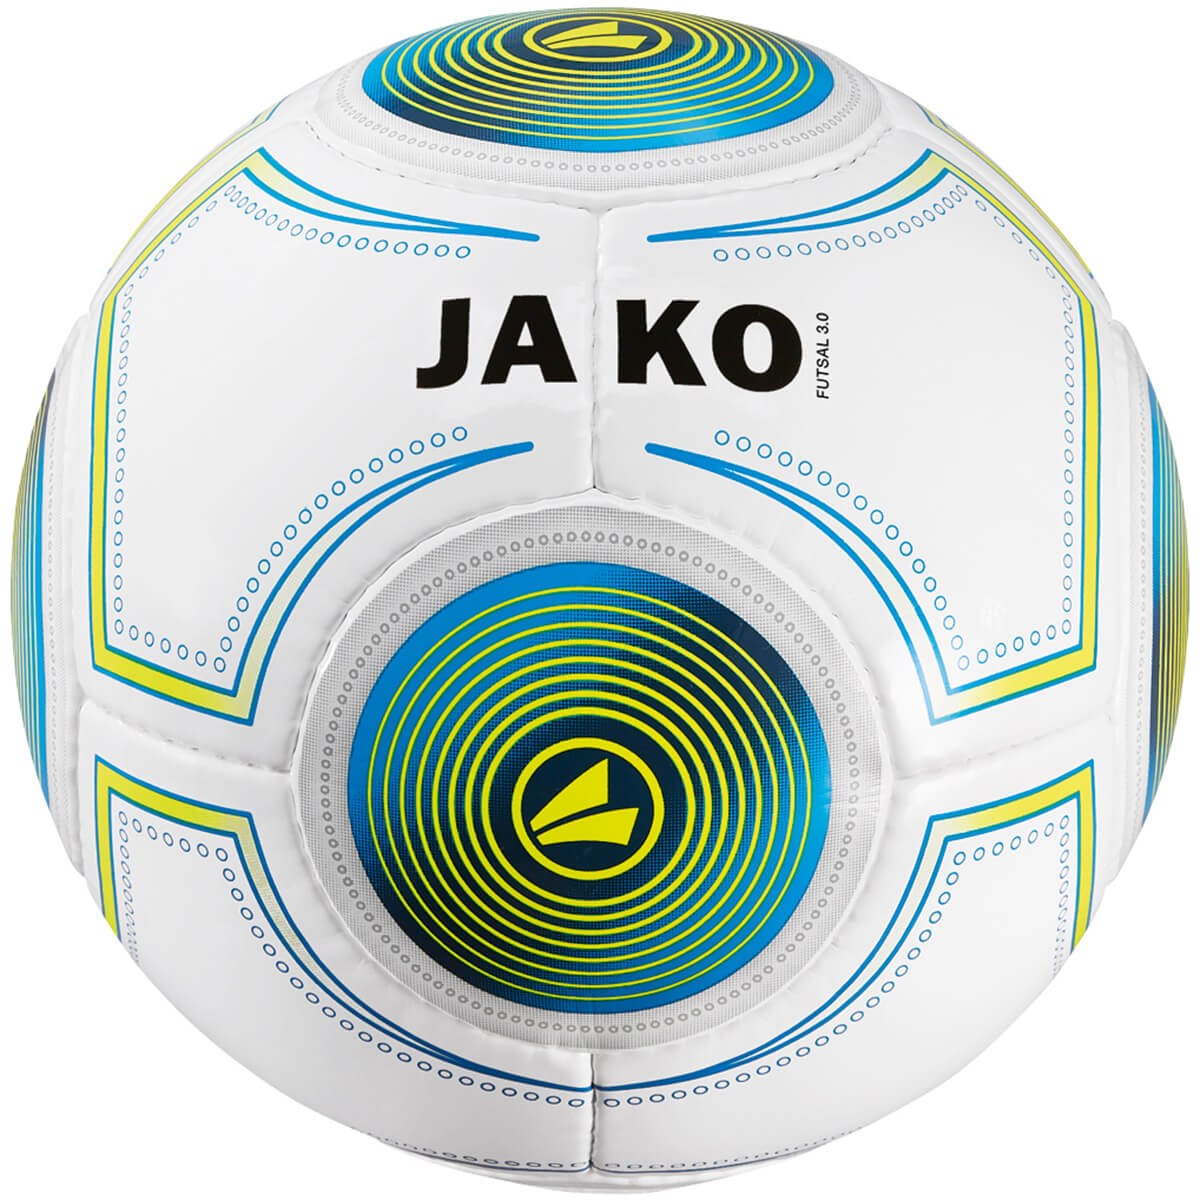 Jako Ball Futsal 3.0  2338  | div. Größen / Farben